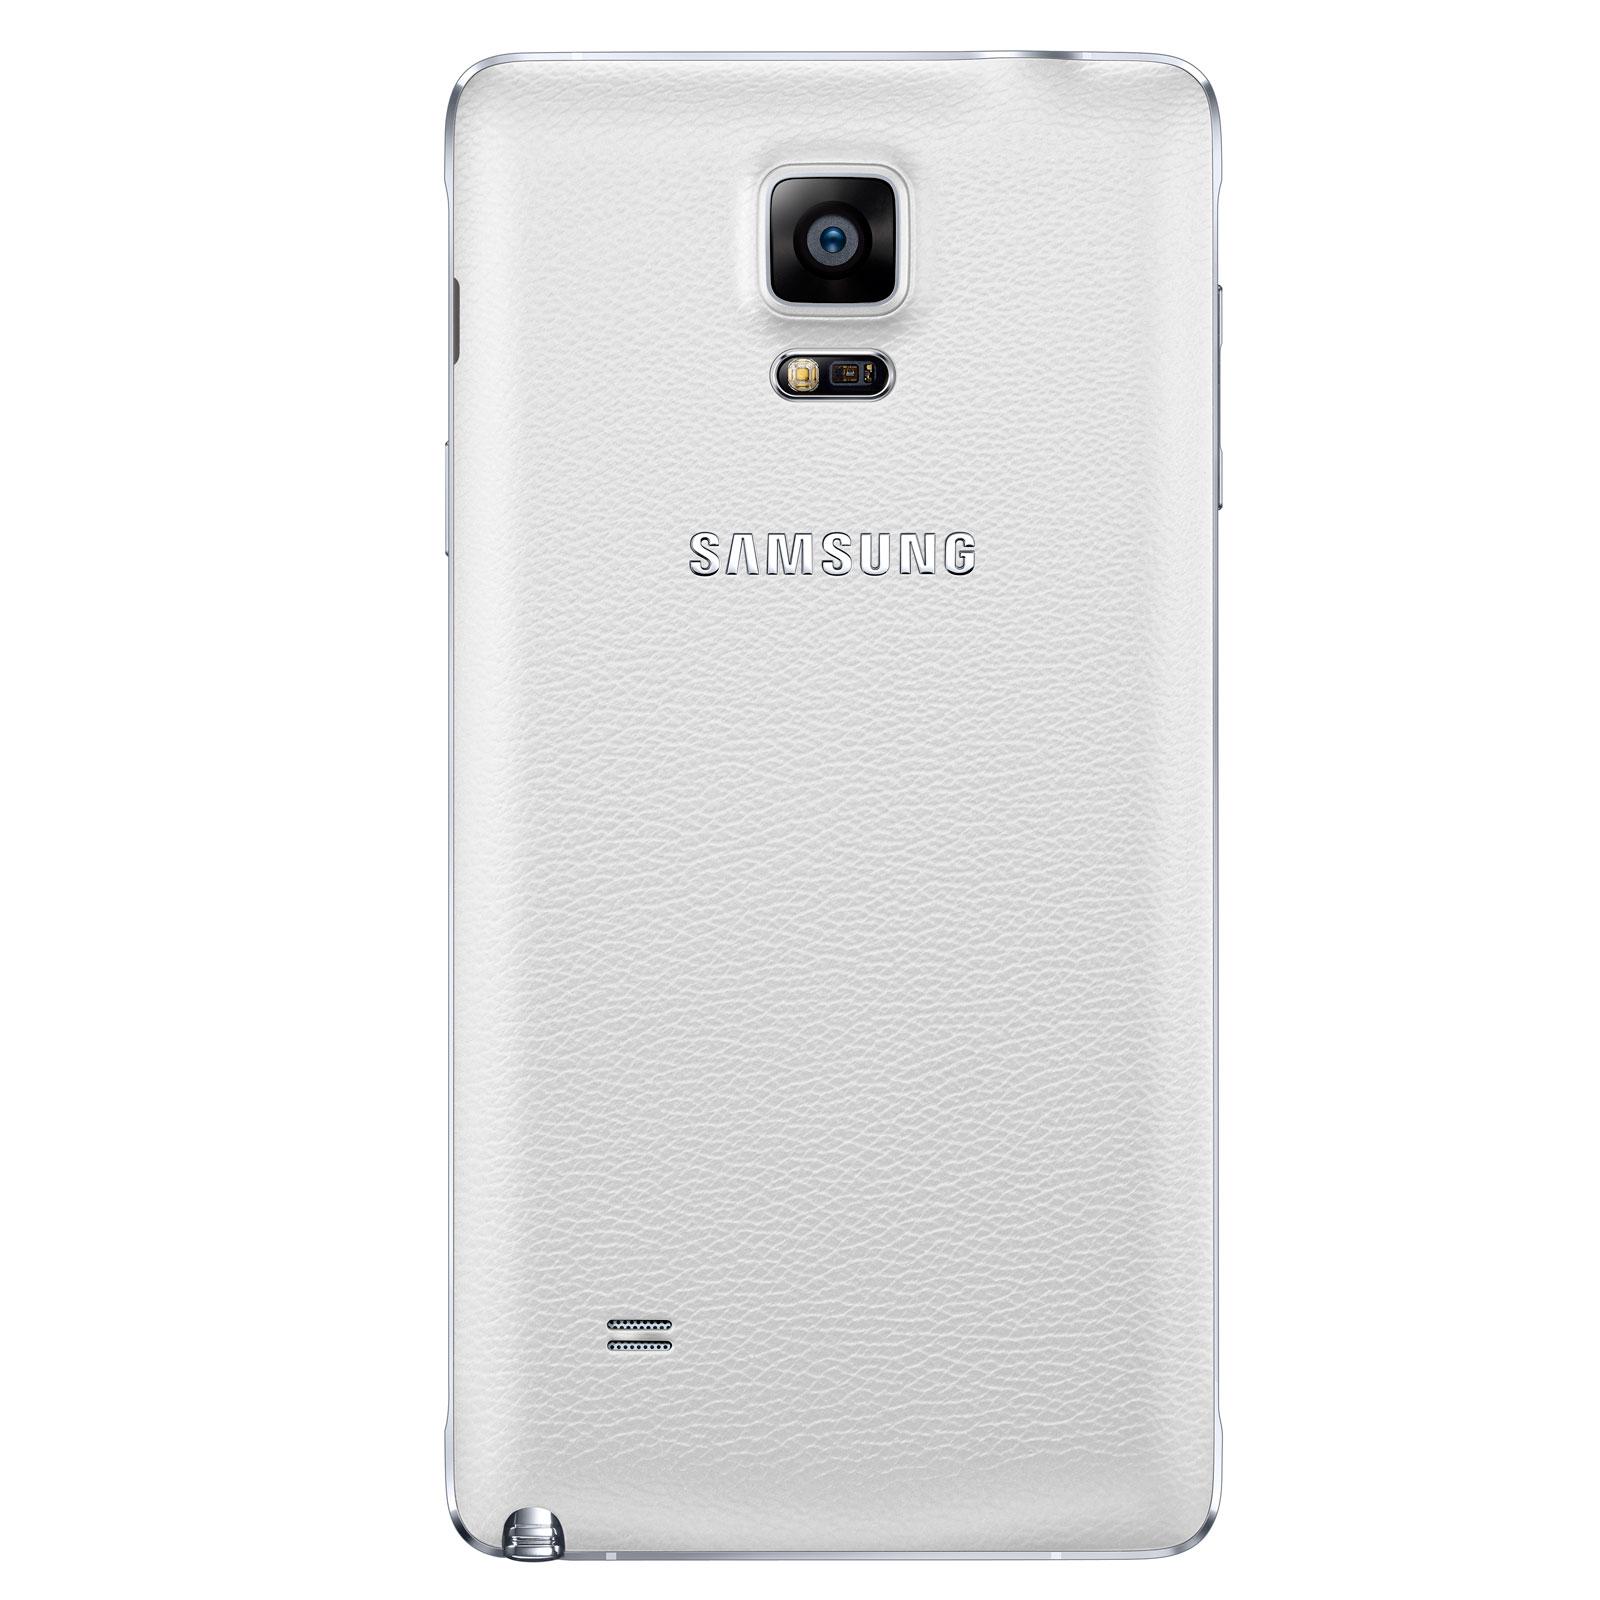 Samsung Galaxy Note 4 N910F 32Go White (SM-N910FZWEXEF) - Achat / Vente Téléphonie sur Cybertek.fr - 4